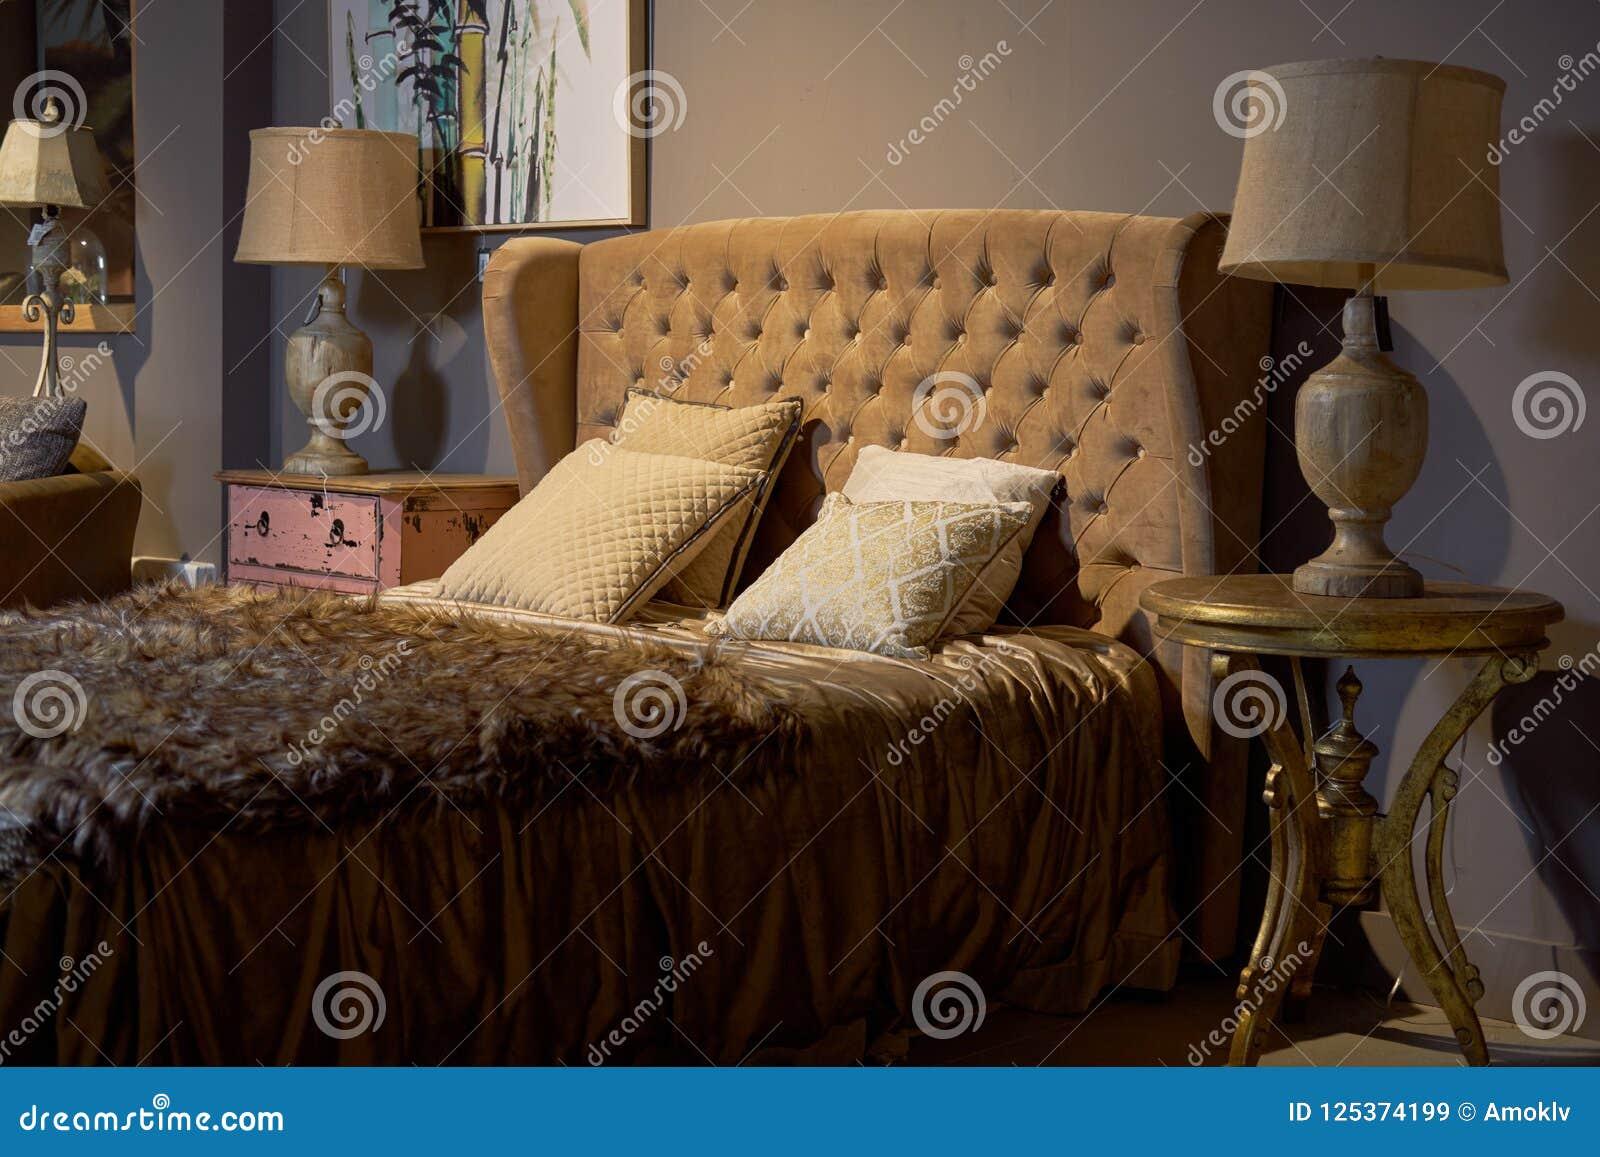 Sala de hotel luxuosa e rica Interior ideal barroco glamoroso, elegante do projeto do quarto Brown, cor bege, ninguém